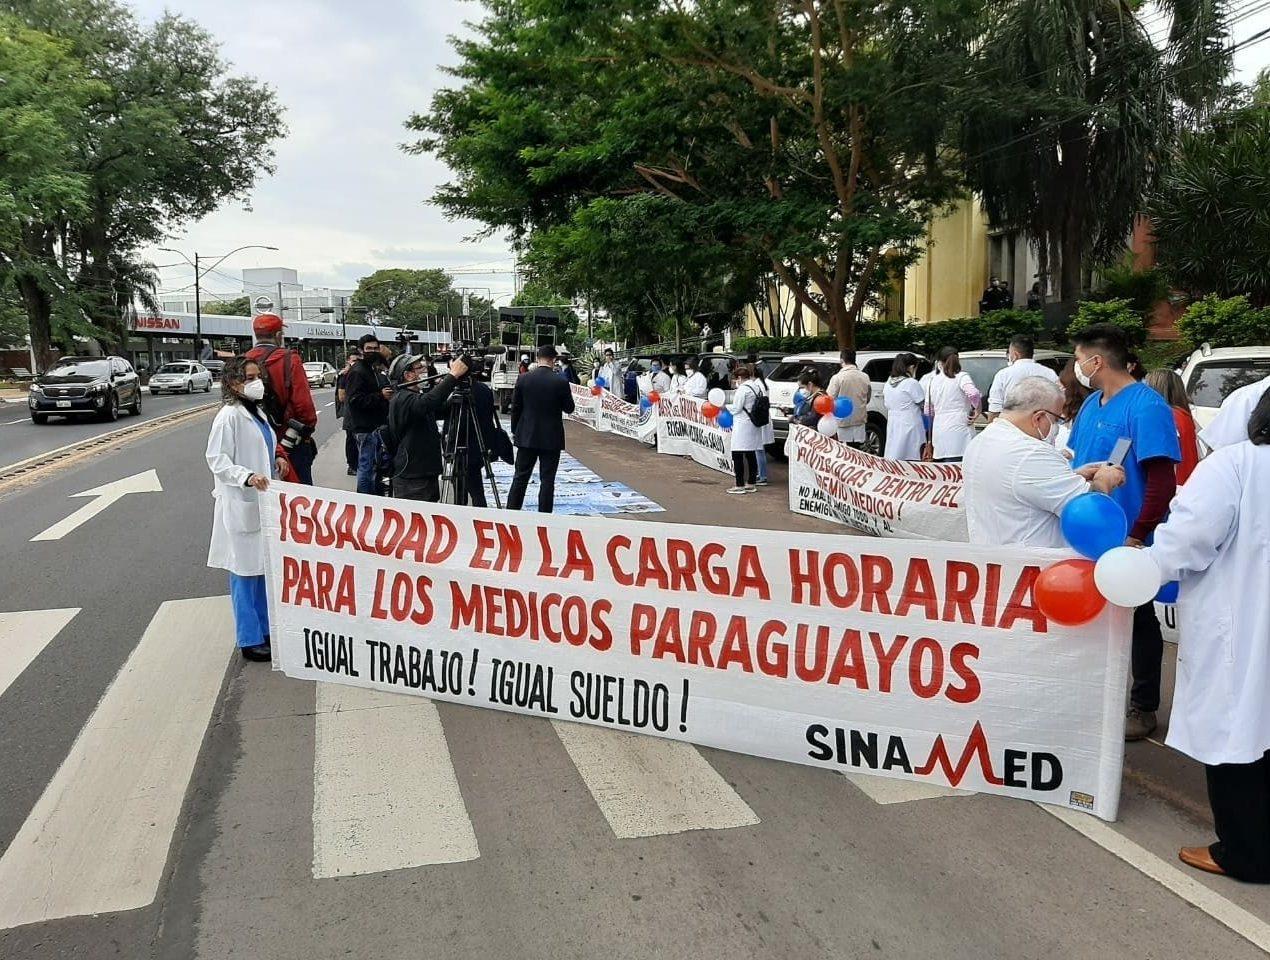 sinamed paraguay medicos 01